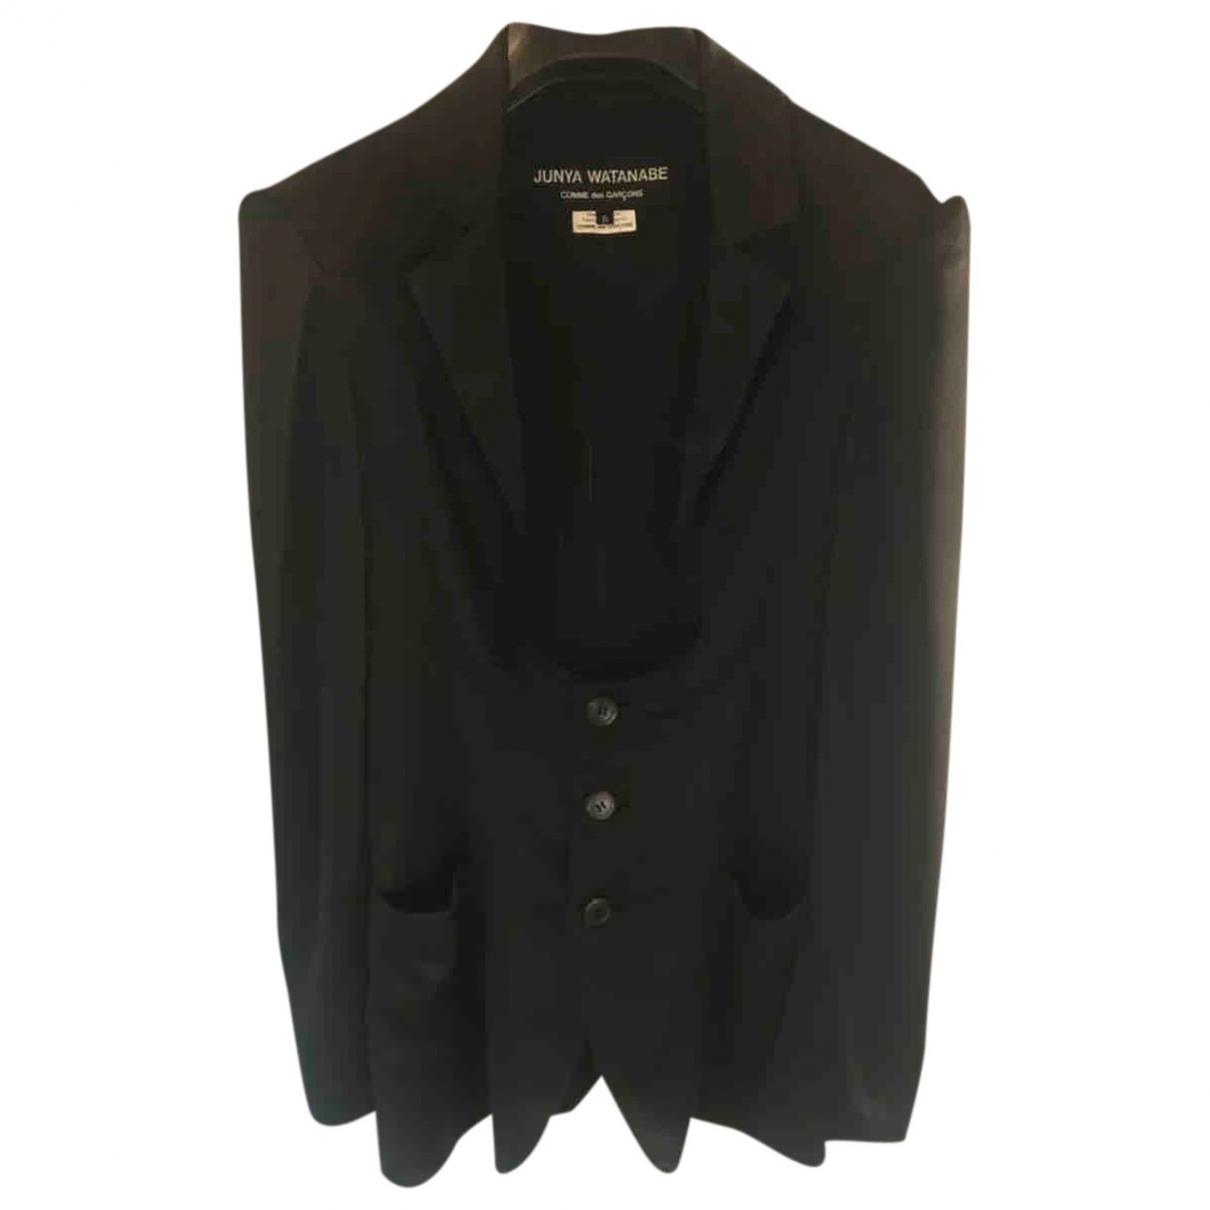 Junya Watanabe \N Black Cotton jacket for Women S International